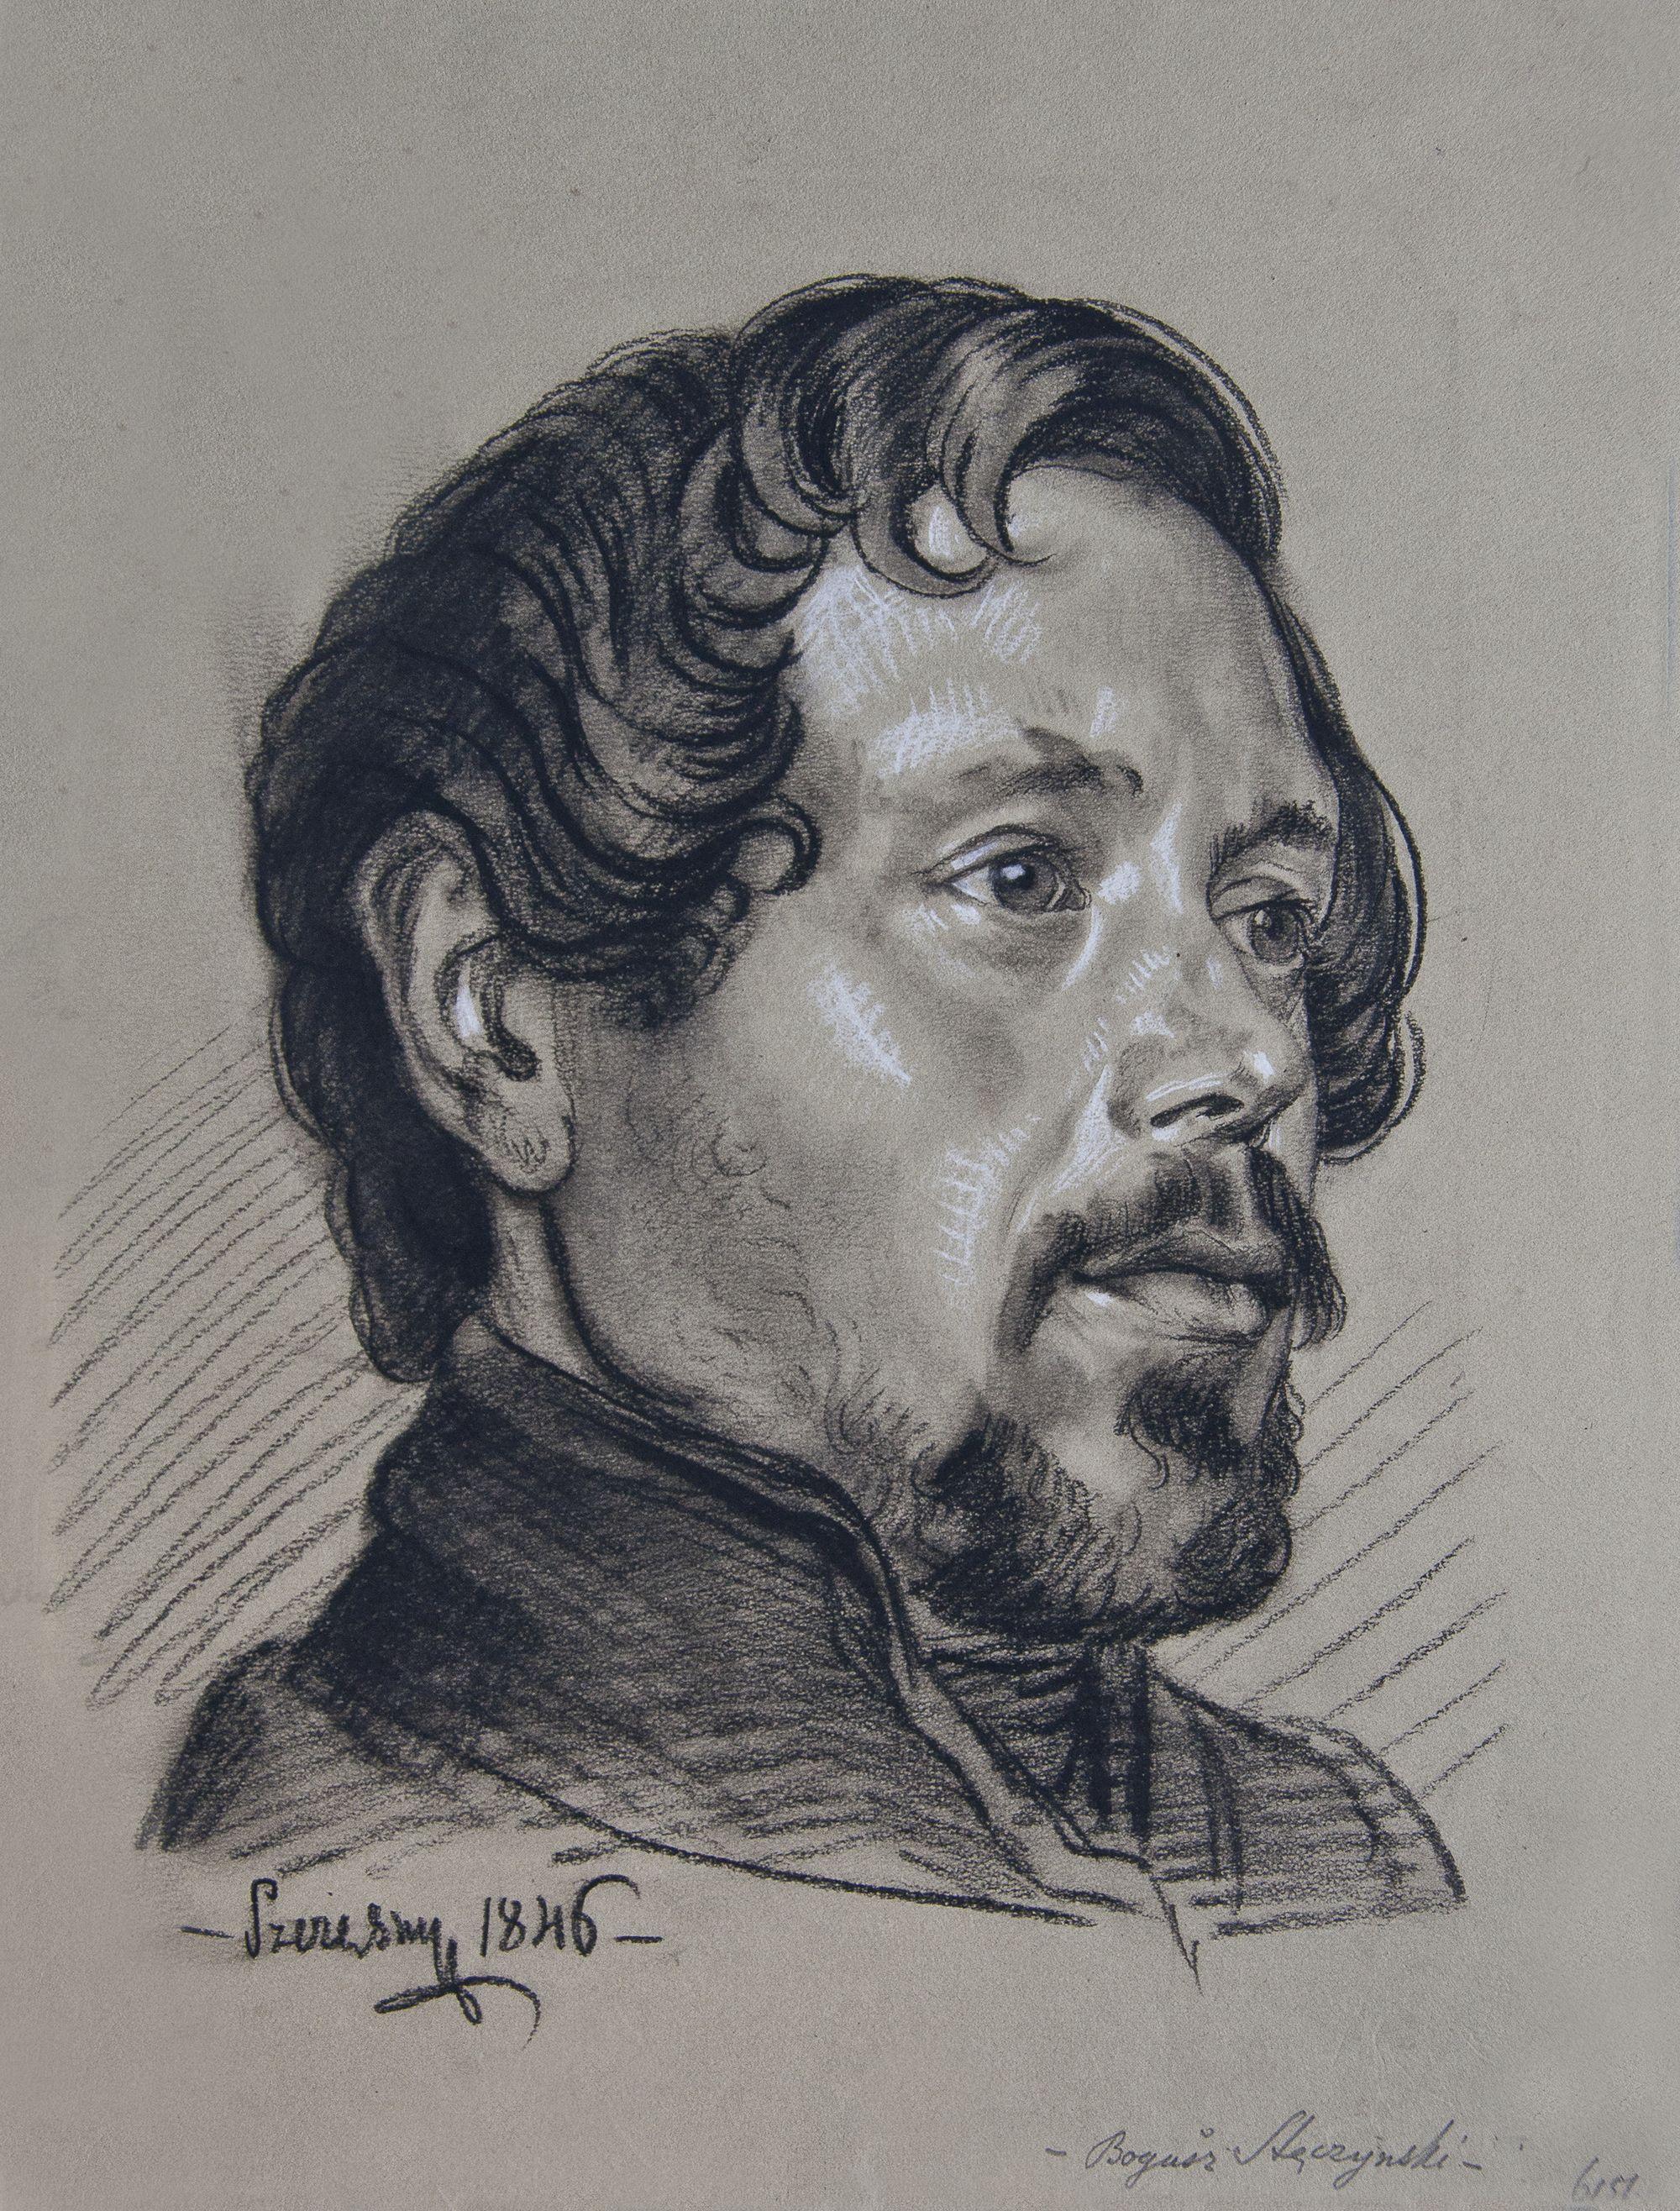 Фелікс Ян Щенсни Моравський. Мацей-Богуш Стенчинський (поет та художник)